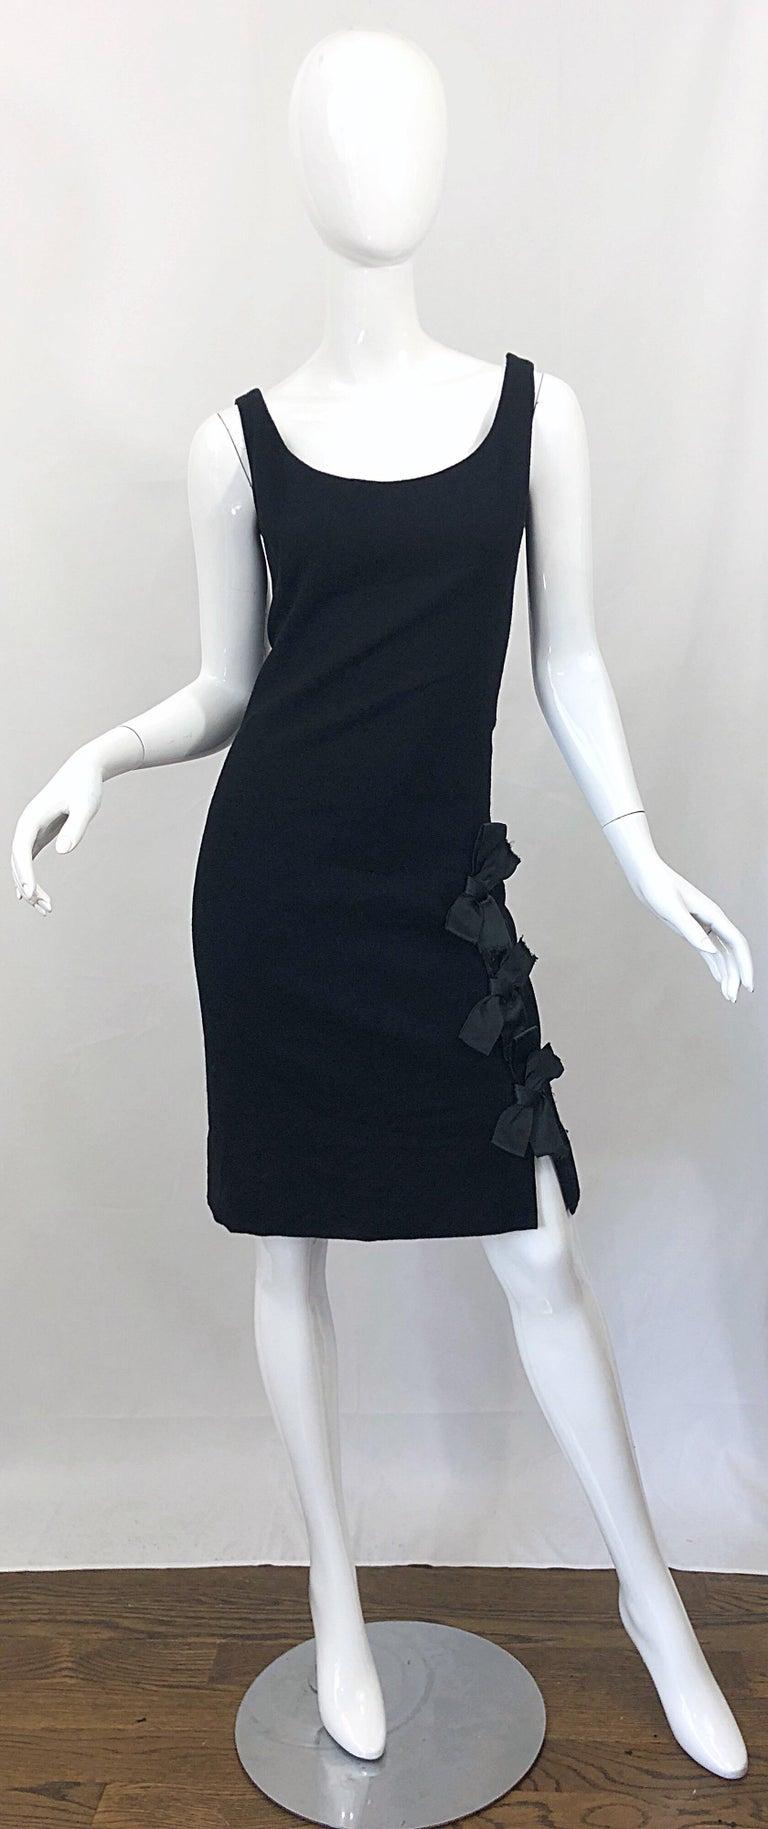 Geoffrey Beene 1960s Black Sleeveless Bow Detail Vintage 60s Wool Sheath Dress For Sale 7